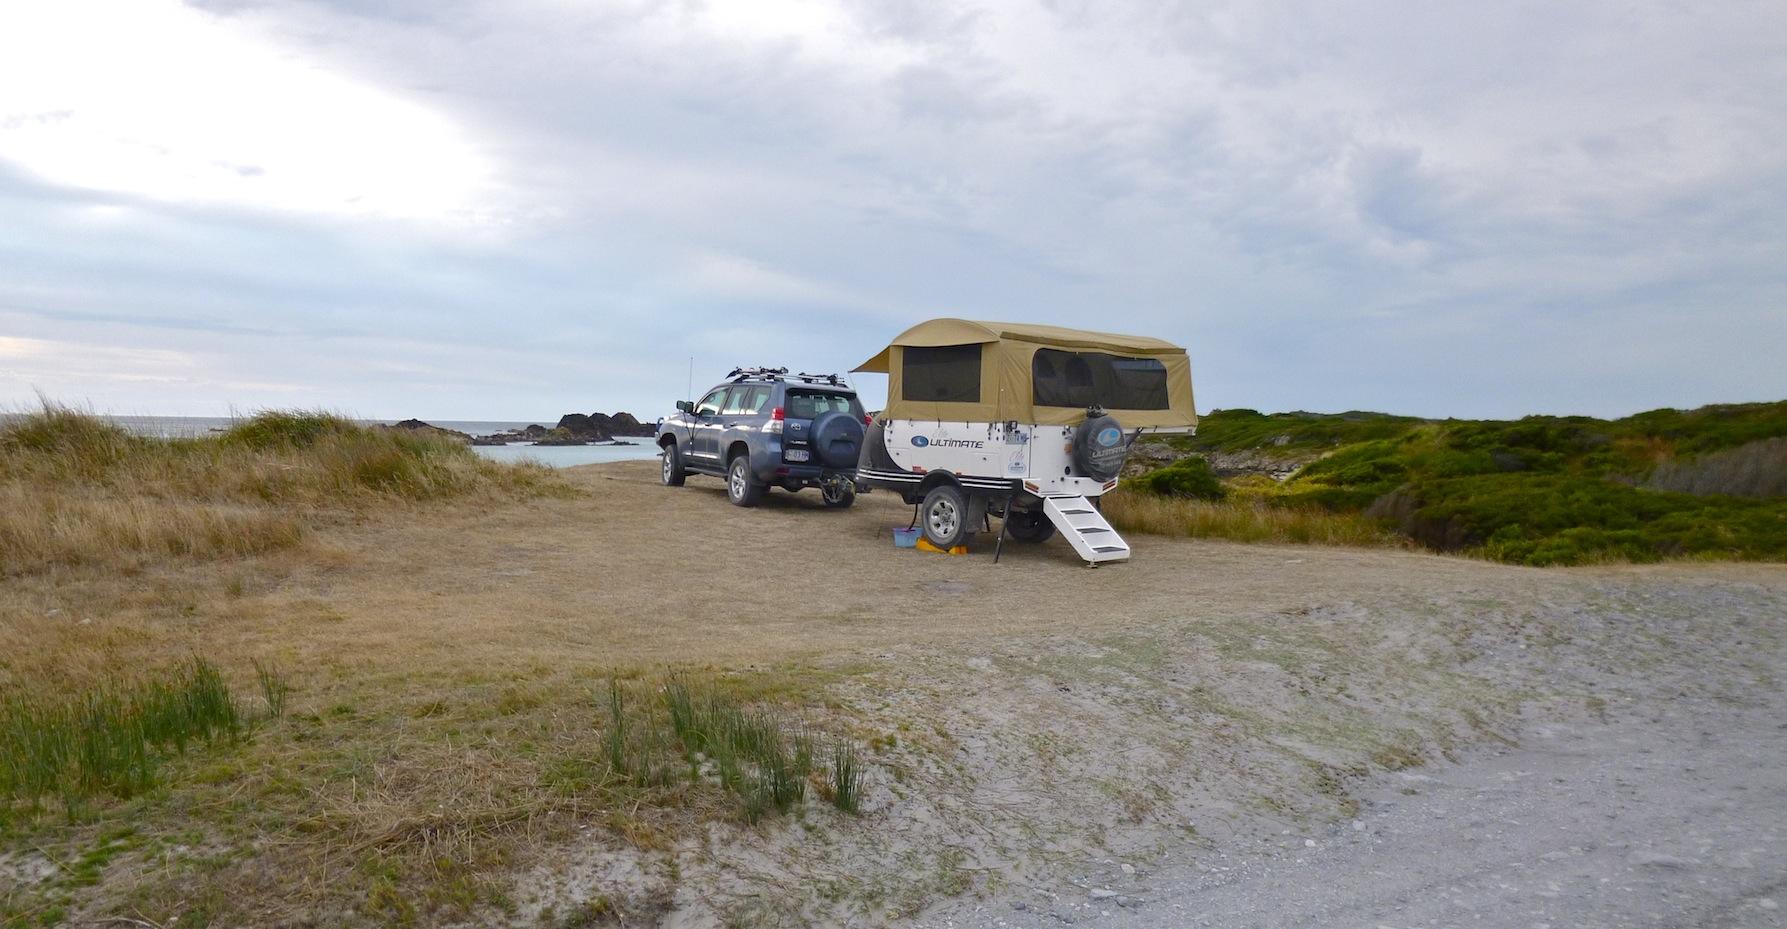 Camping at Couta Rocks